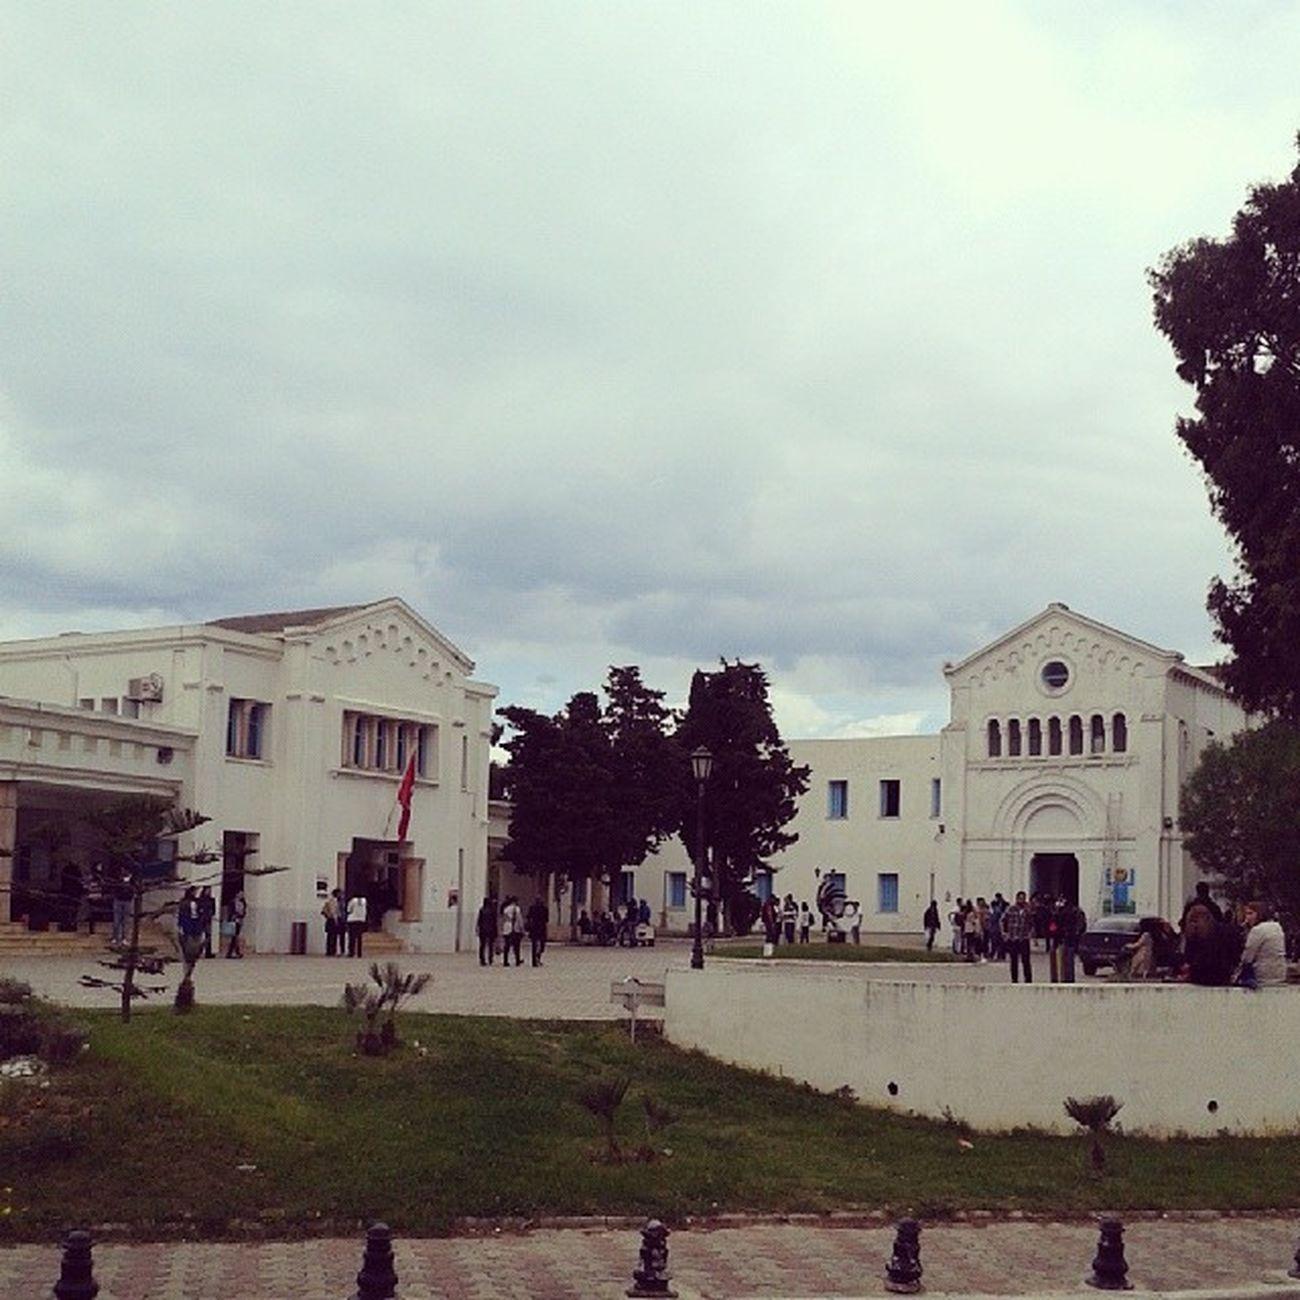 Idreamoftunisia InstagramTunisie Instagramtn Cloudy sky IHEC Carthage Tunisia